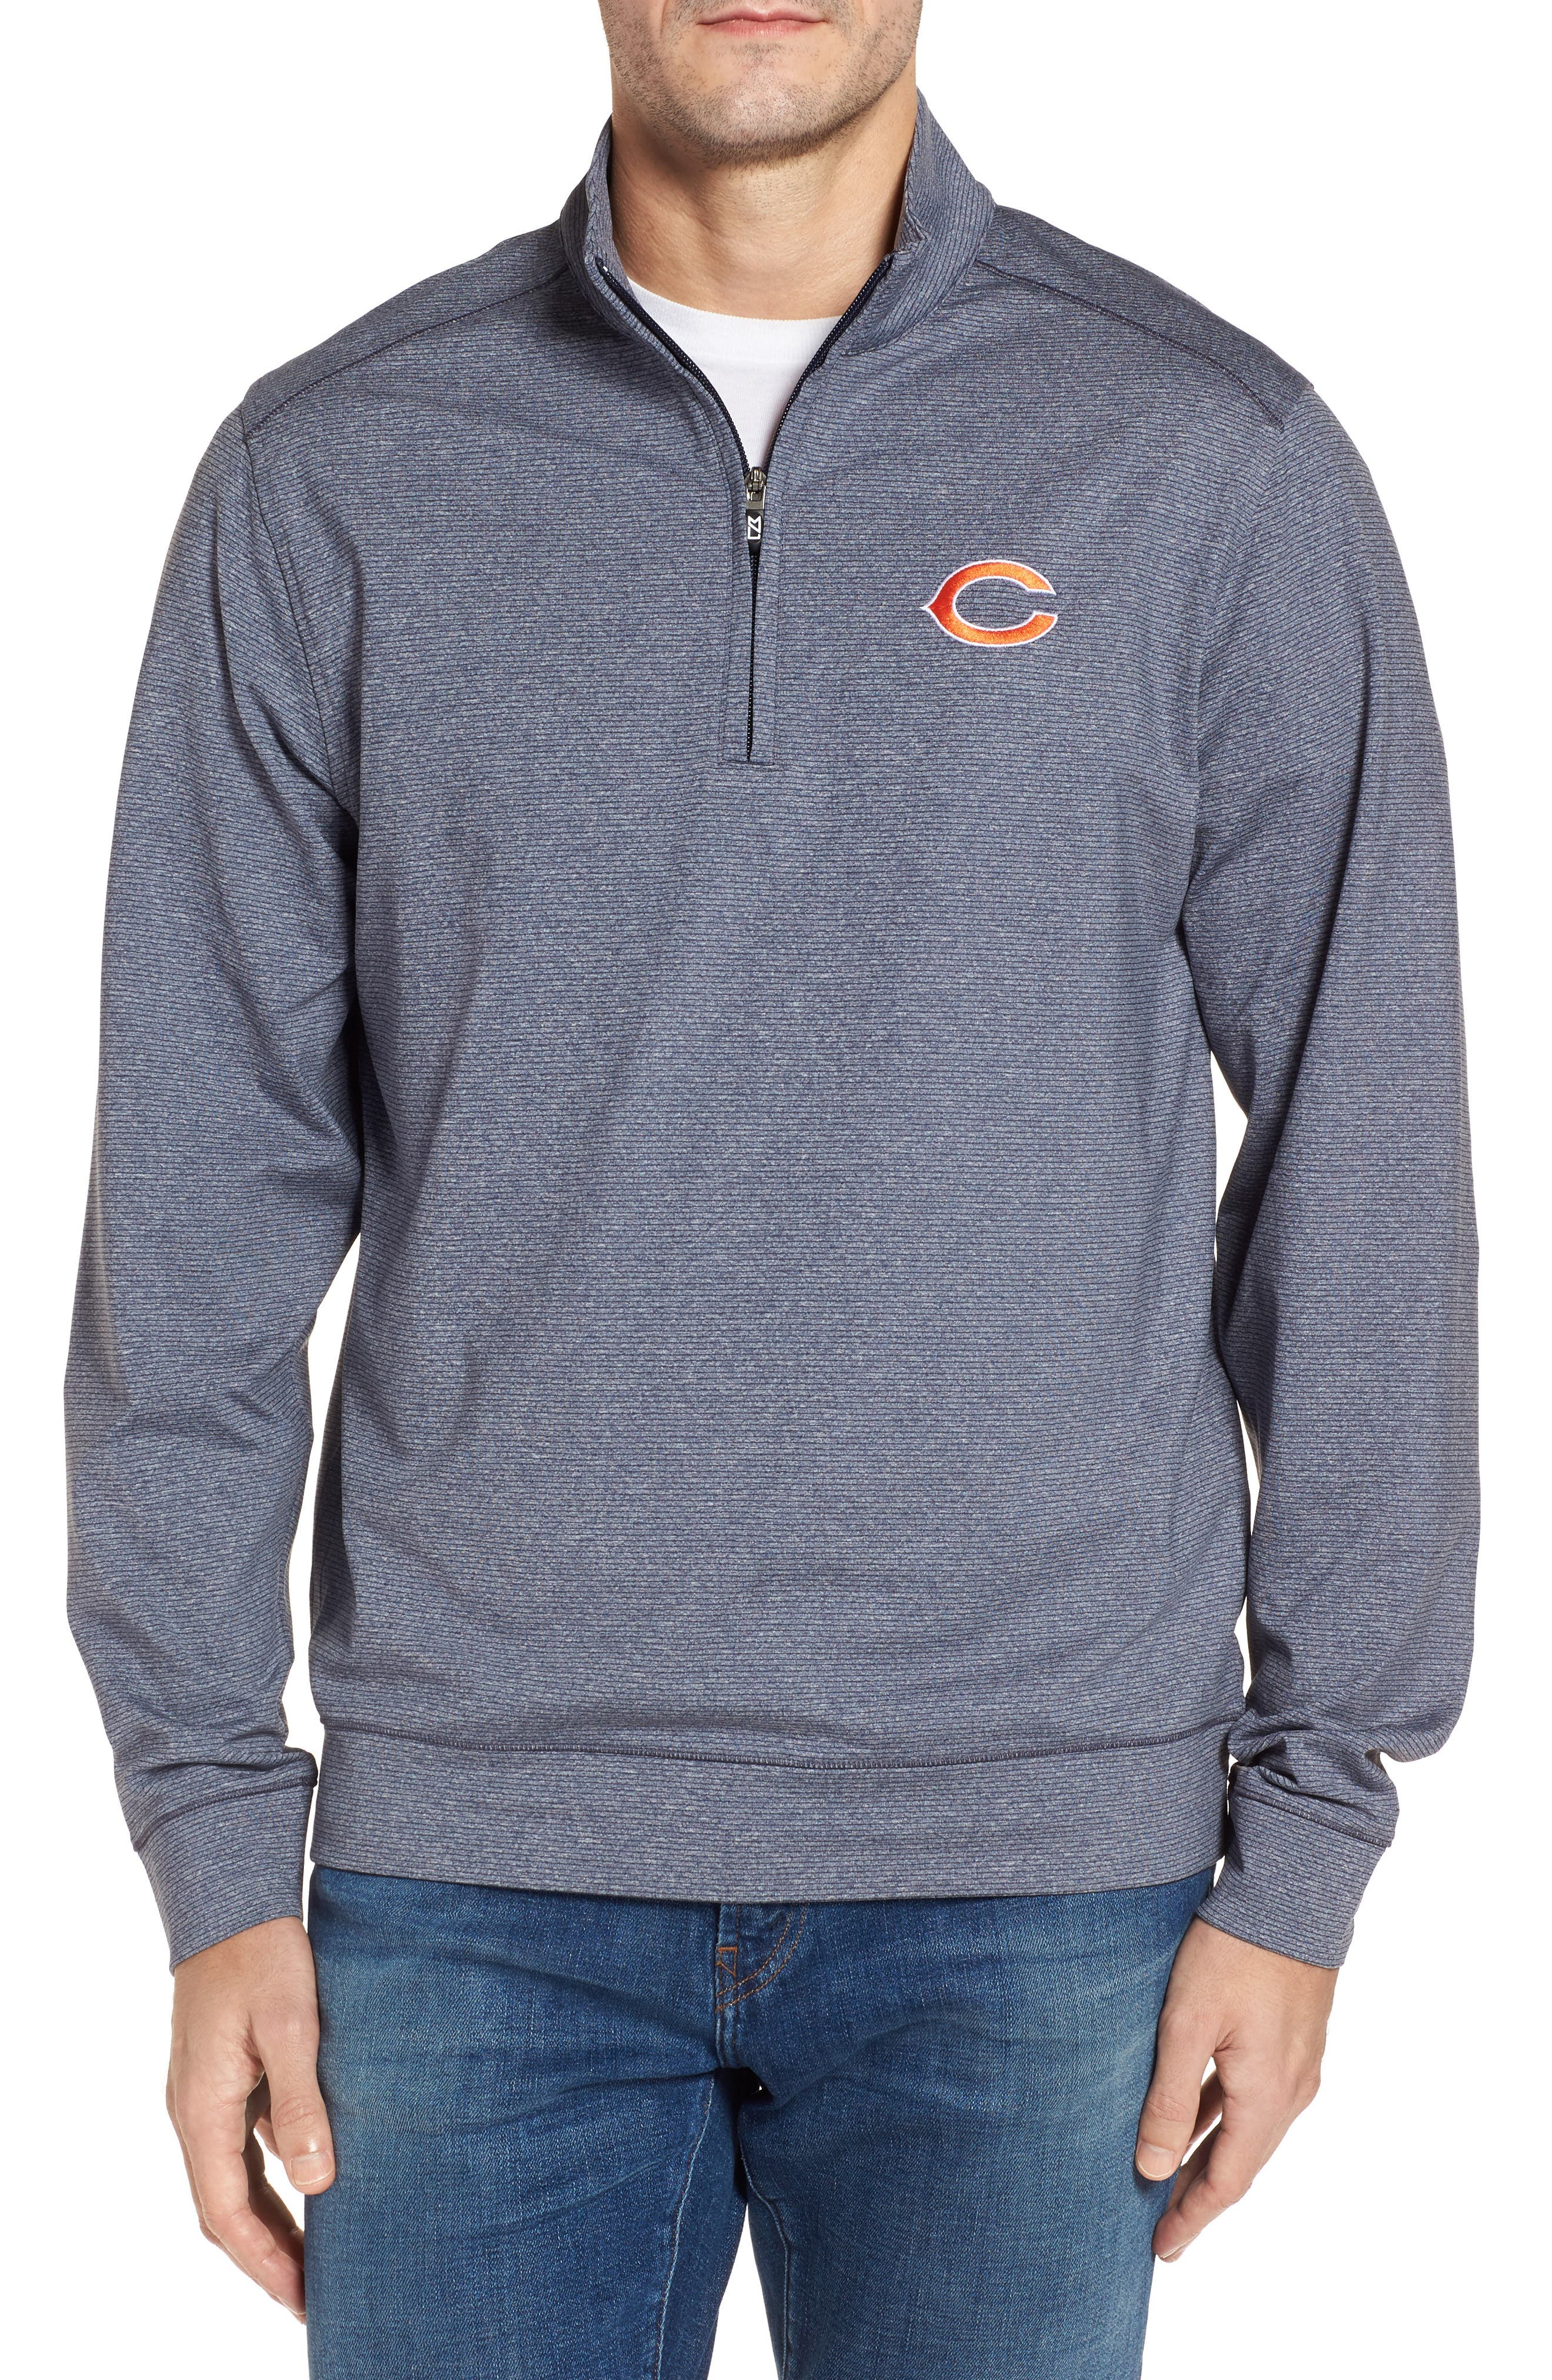 Main Image - Cutter & Buck Shoreline - Chicago Bears Half Zip Pullover